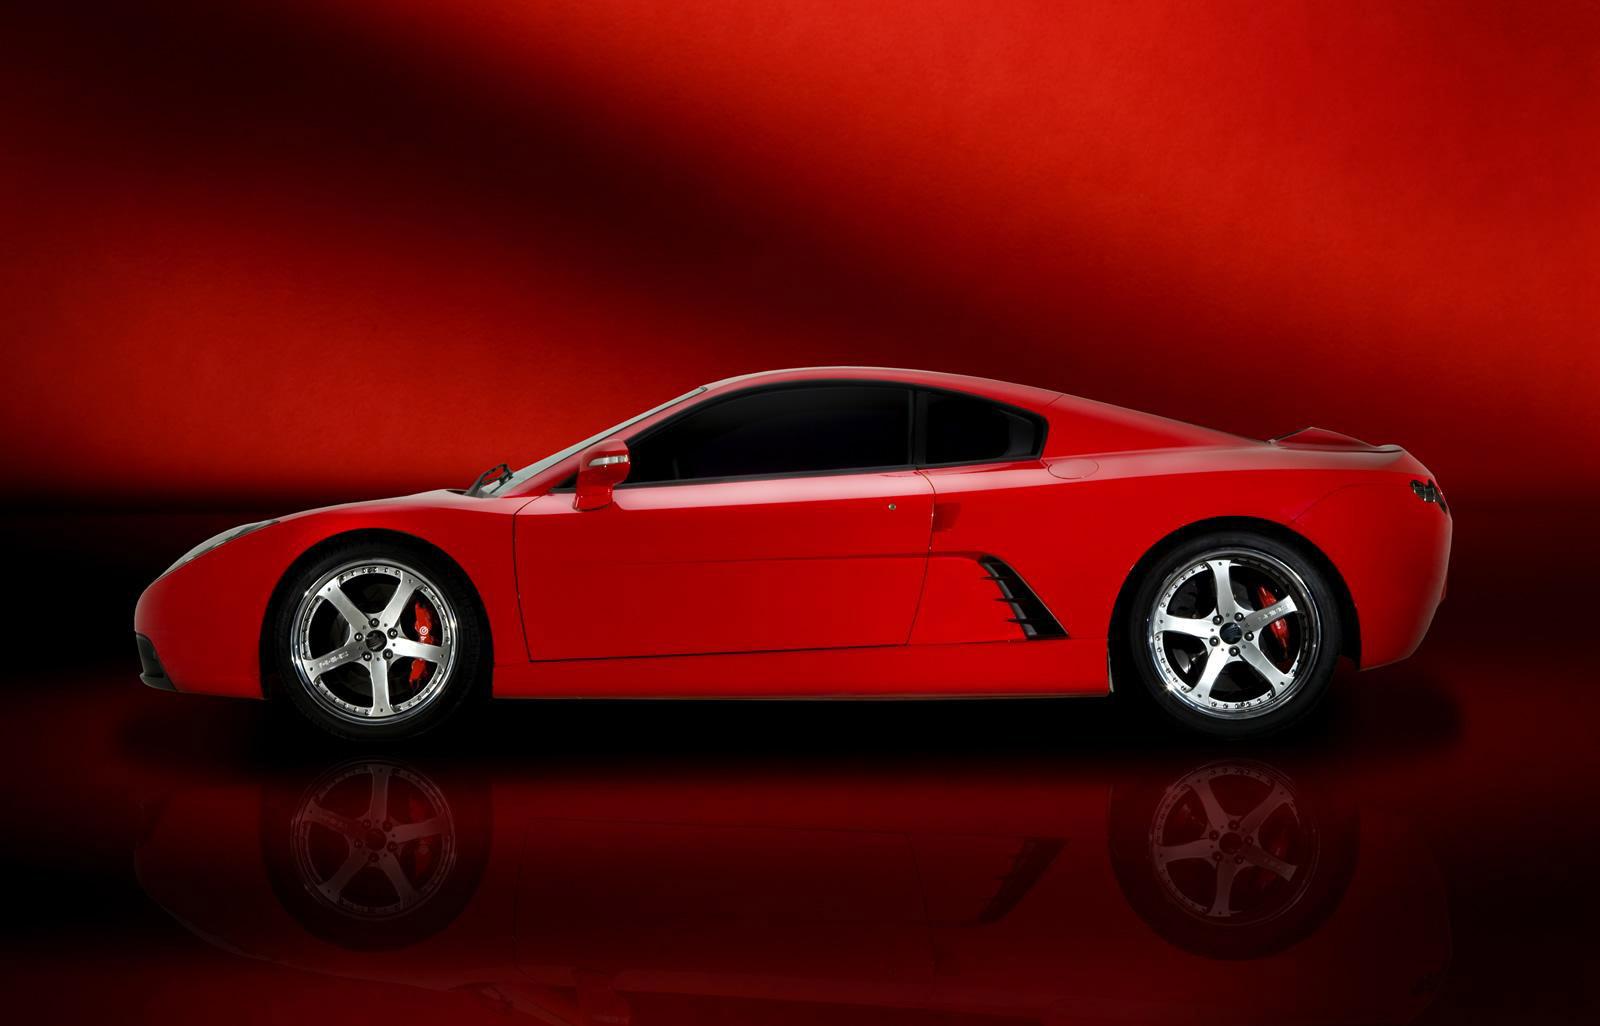 Korean Super Sports Car